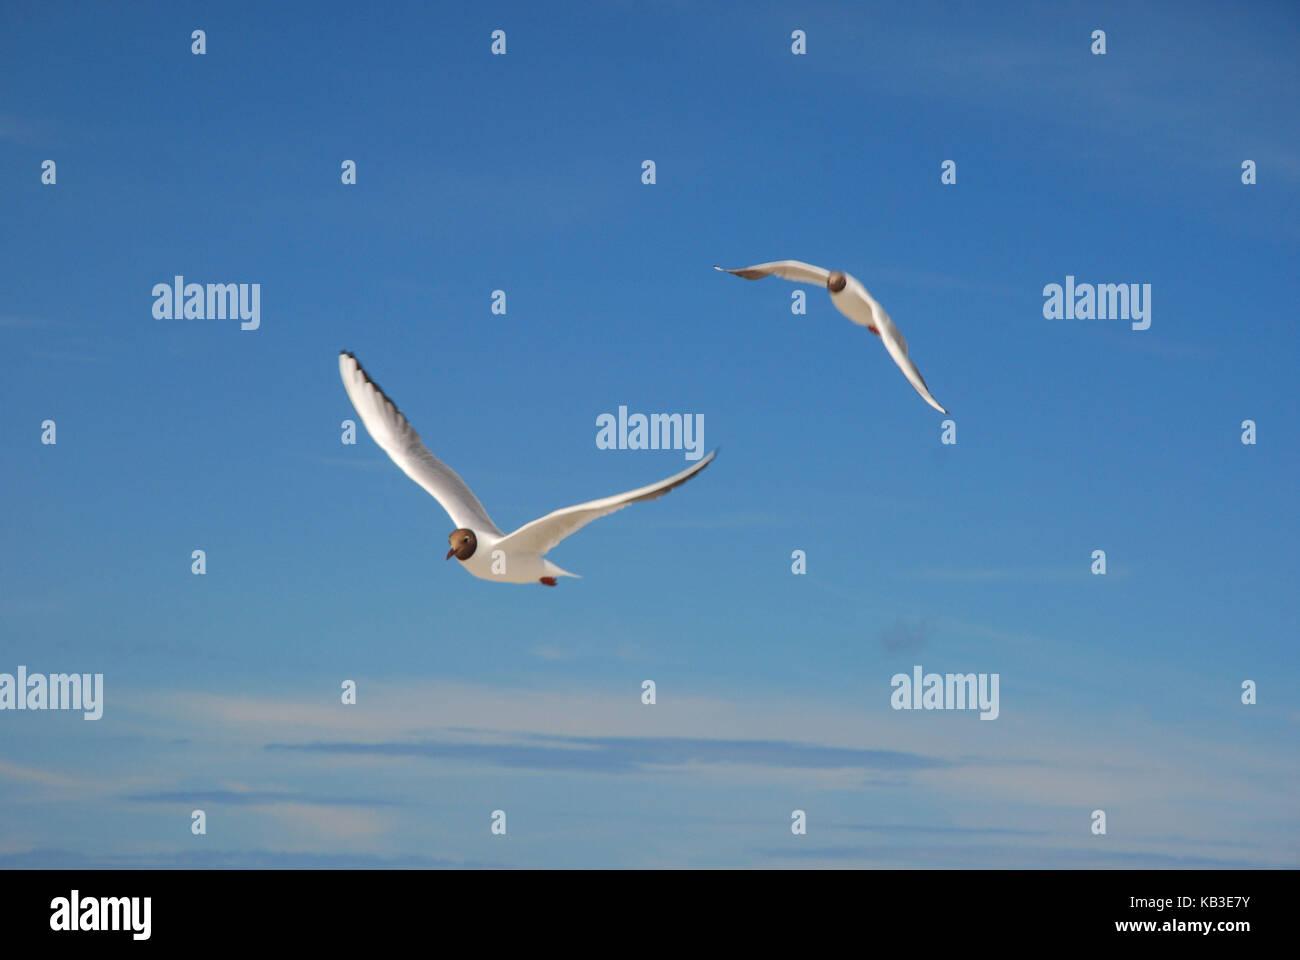 Ornithology, sea bird, black-headed gulls, flight - Stock Image